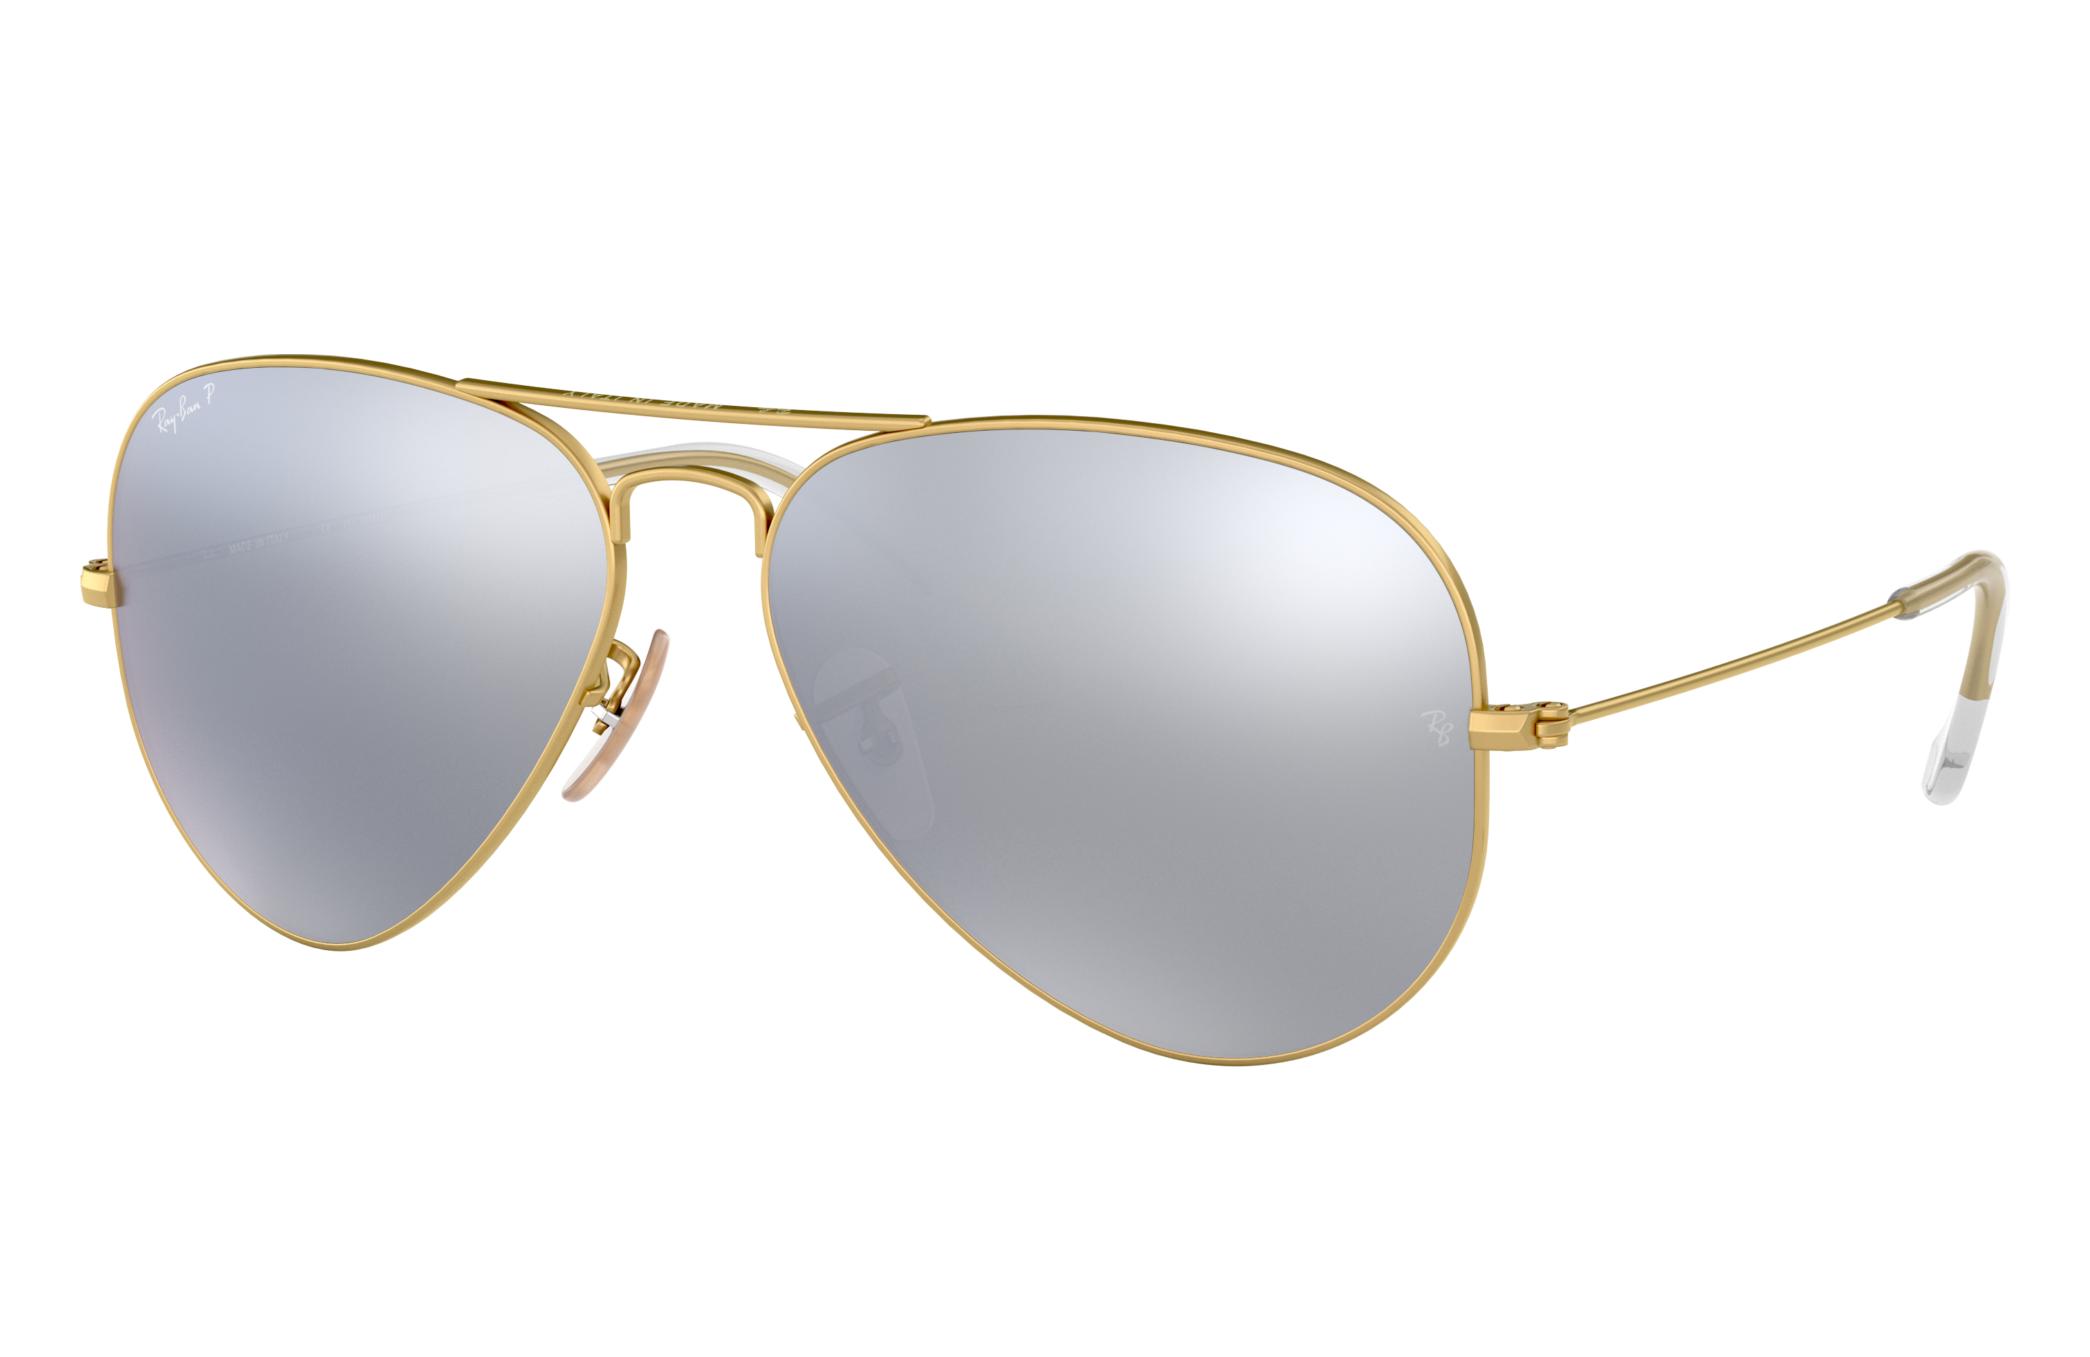 Ray-Ban Aviator Flash Lenses Gold, Polarized Gray Lenses - RB3025